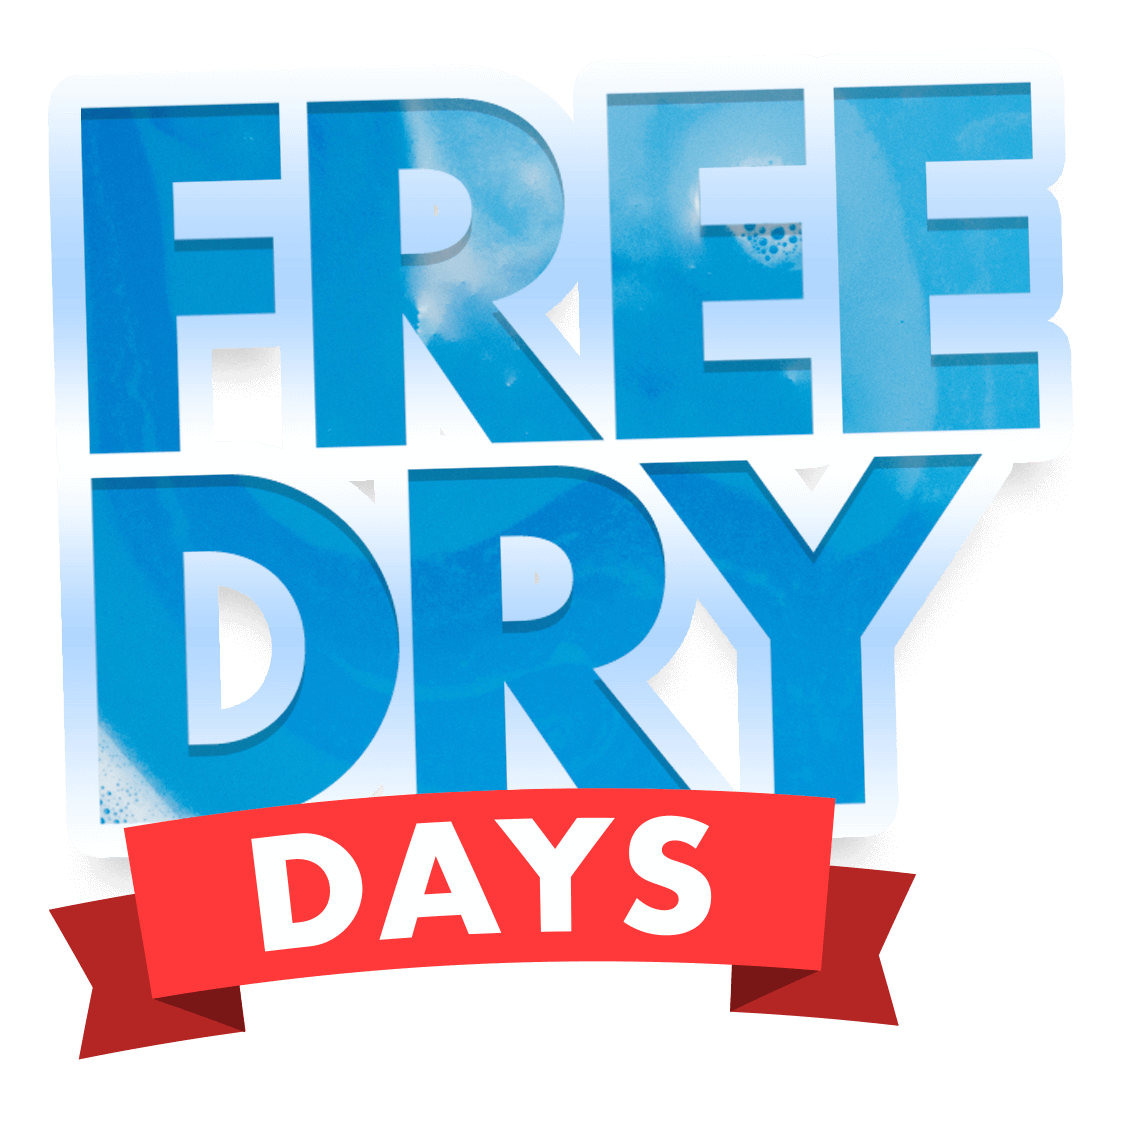 FREE DRY DAYS